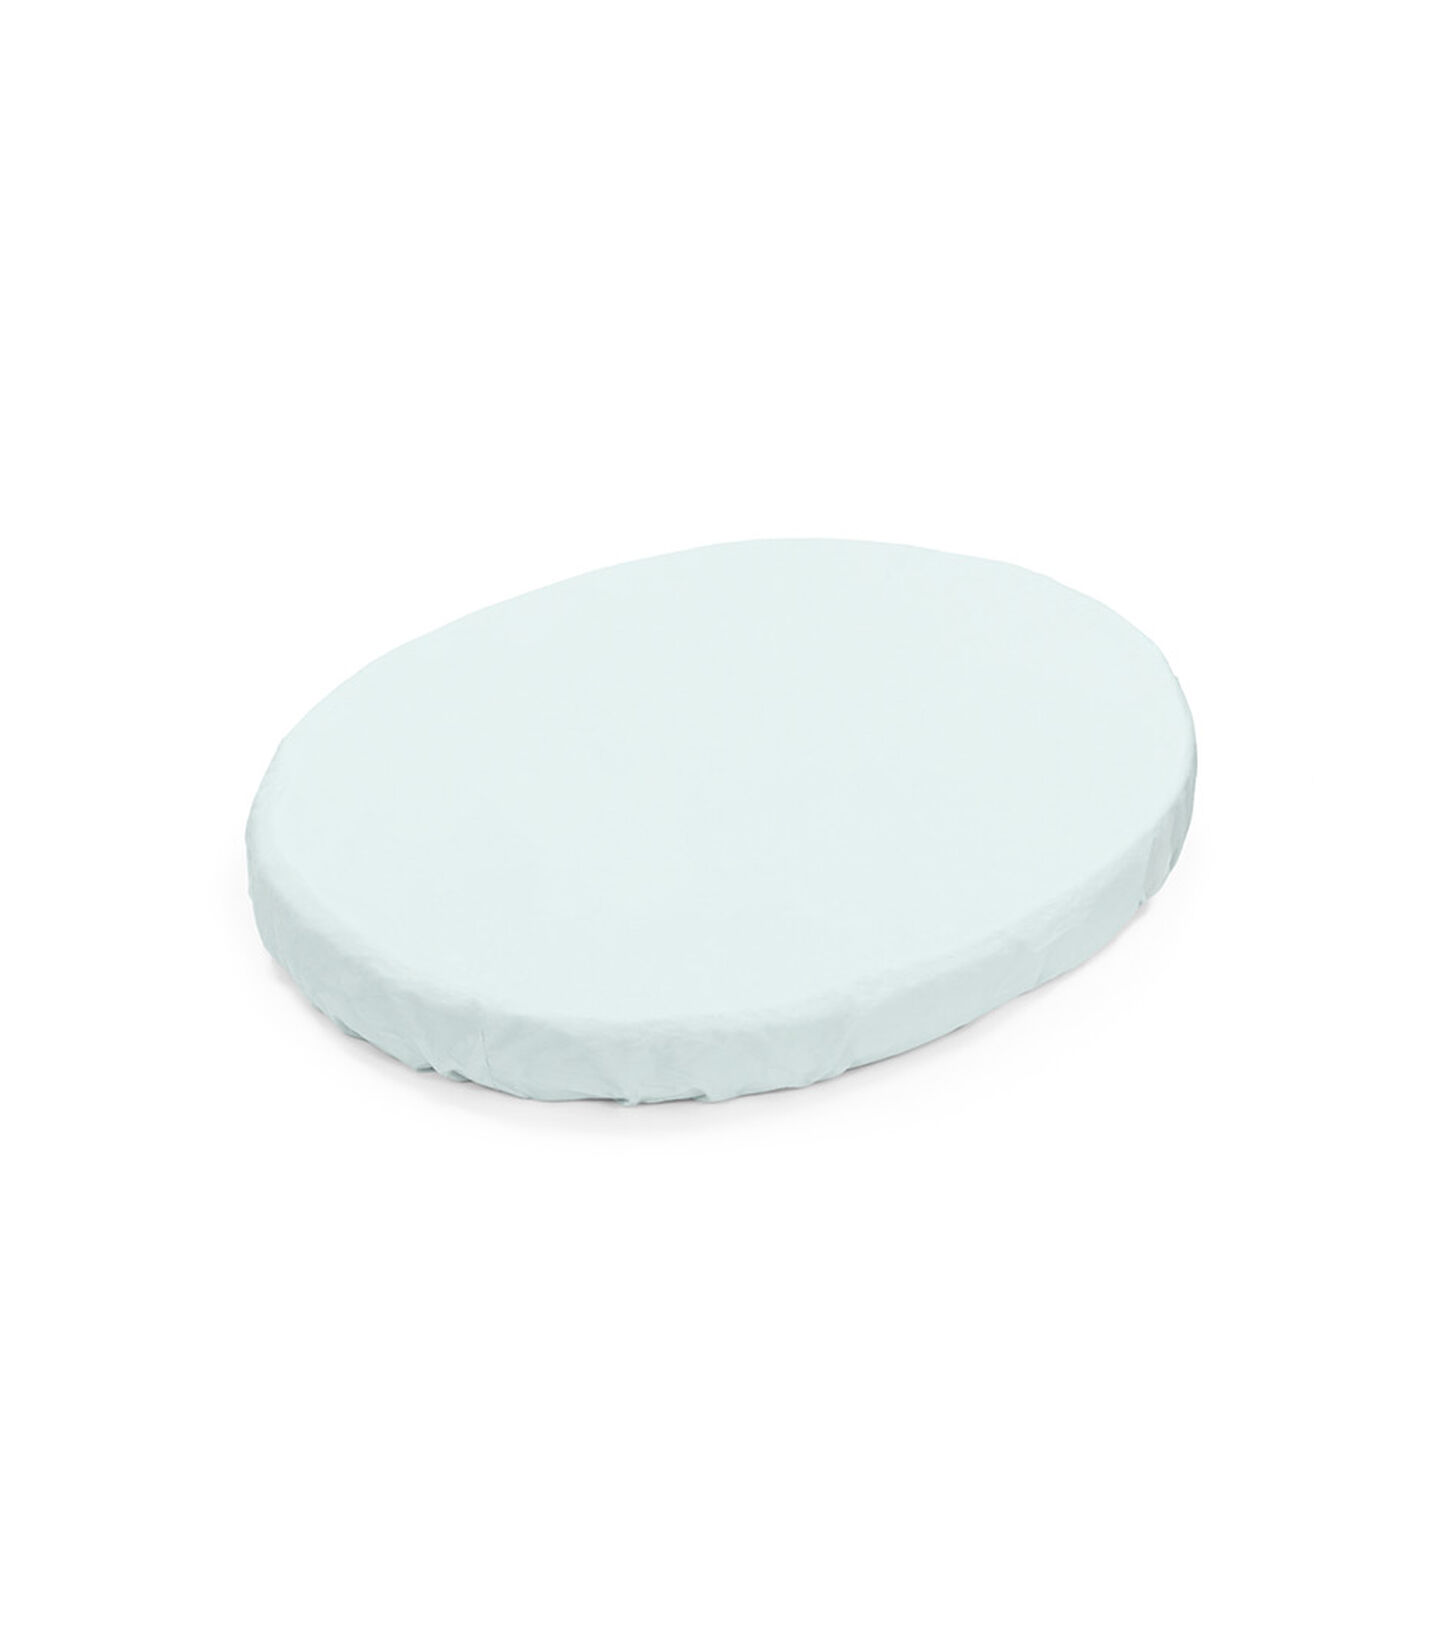 Stokke® Sleepi™ Mini Fitted Sheet. Powder Blue. view 1